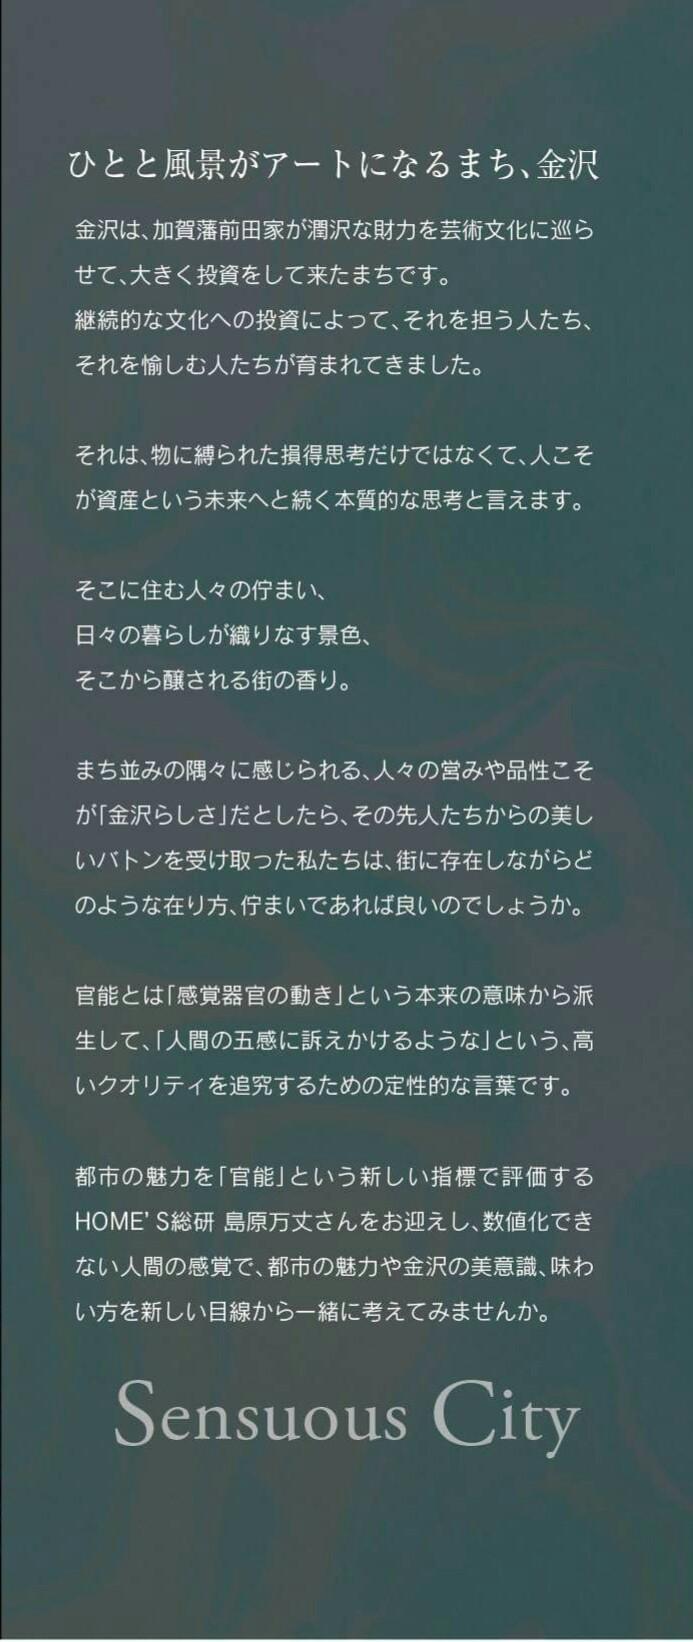 SensuousCity 官能都市・金沢  ひとと風景がアートになるまち_e0334462_01395248.jpg